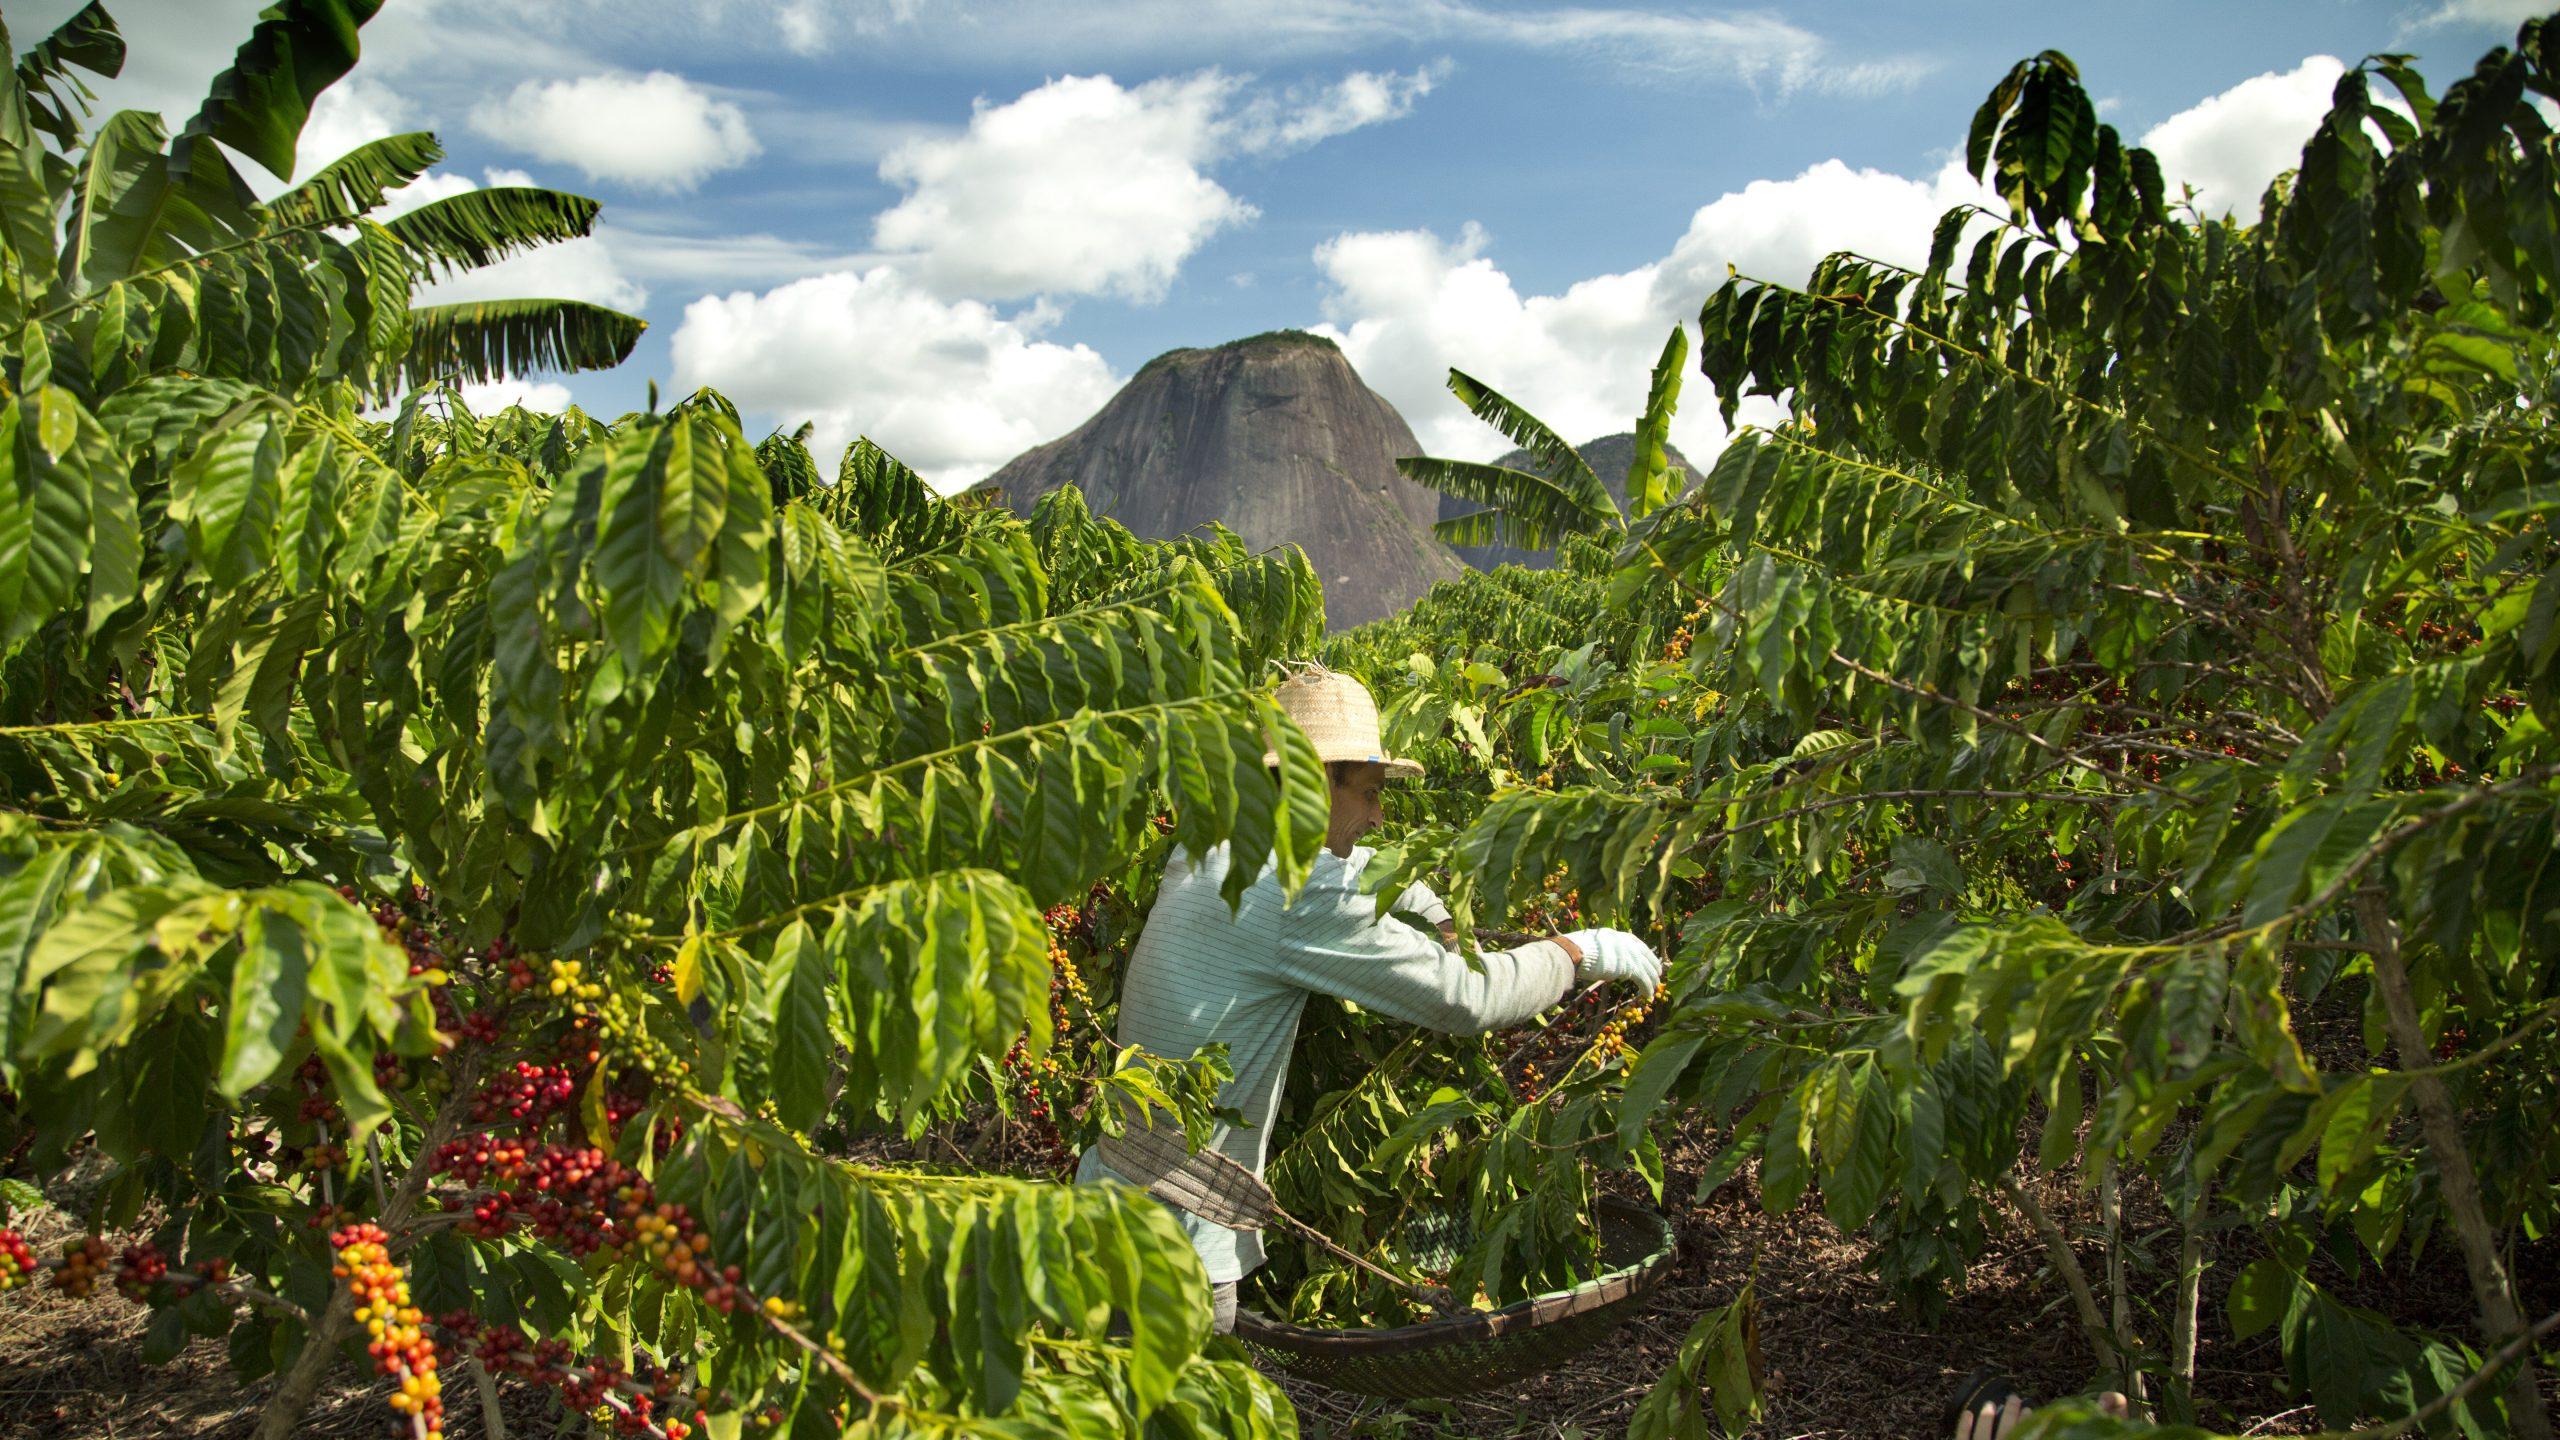 Nestlé supports transition to a regenerative food system